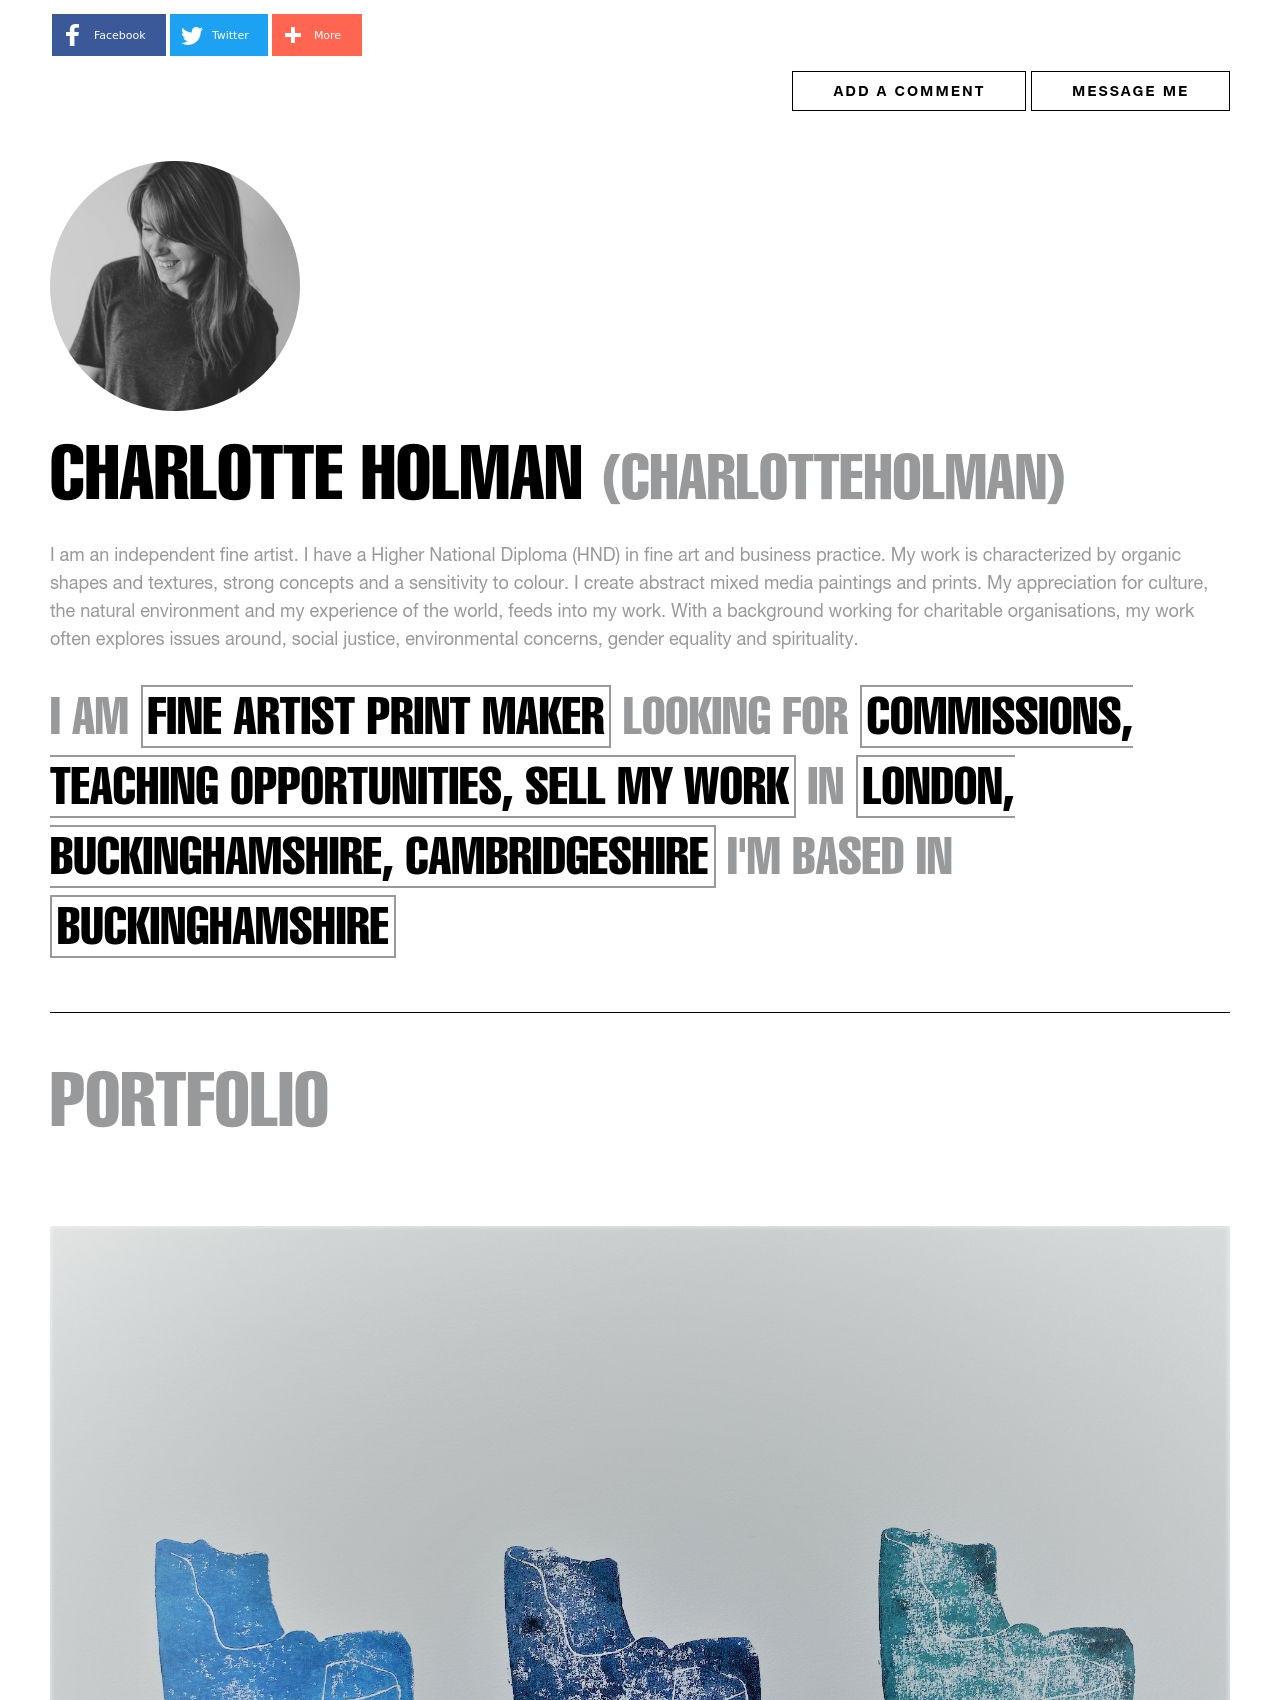 Charlotte Holman